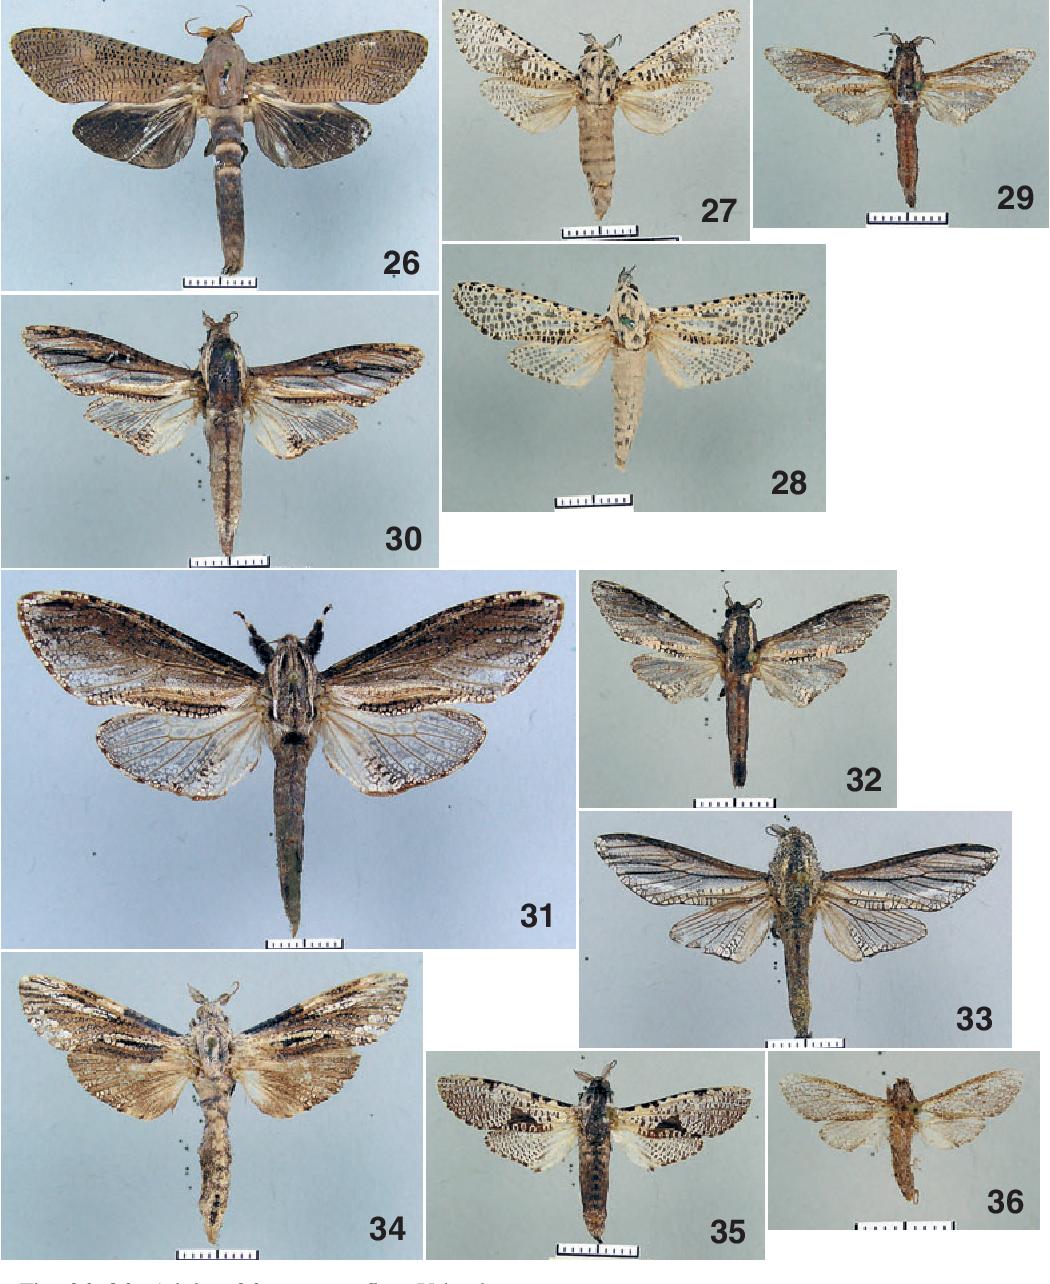 figure 26-36